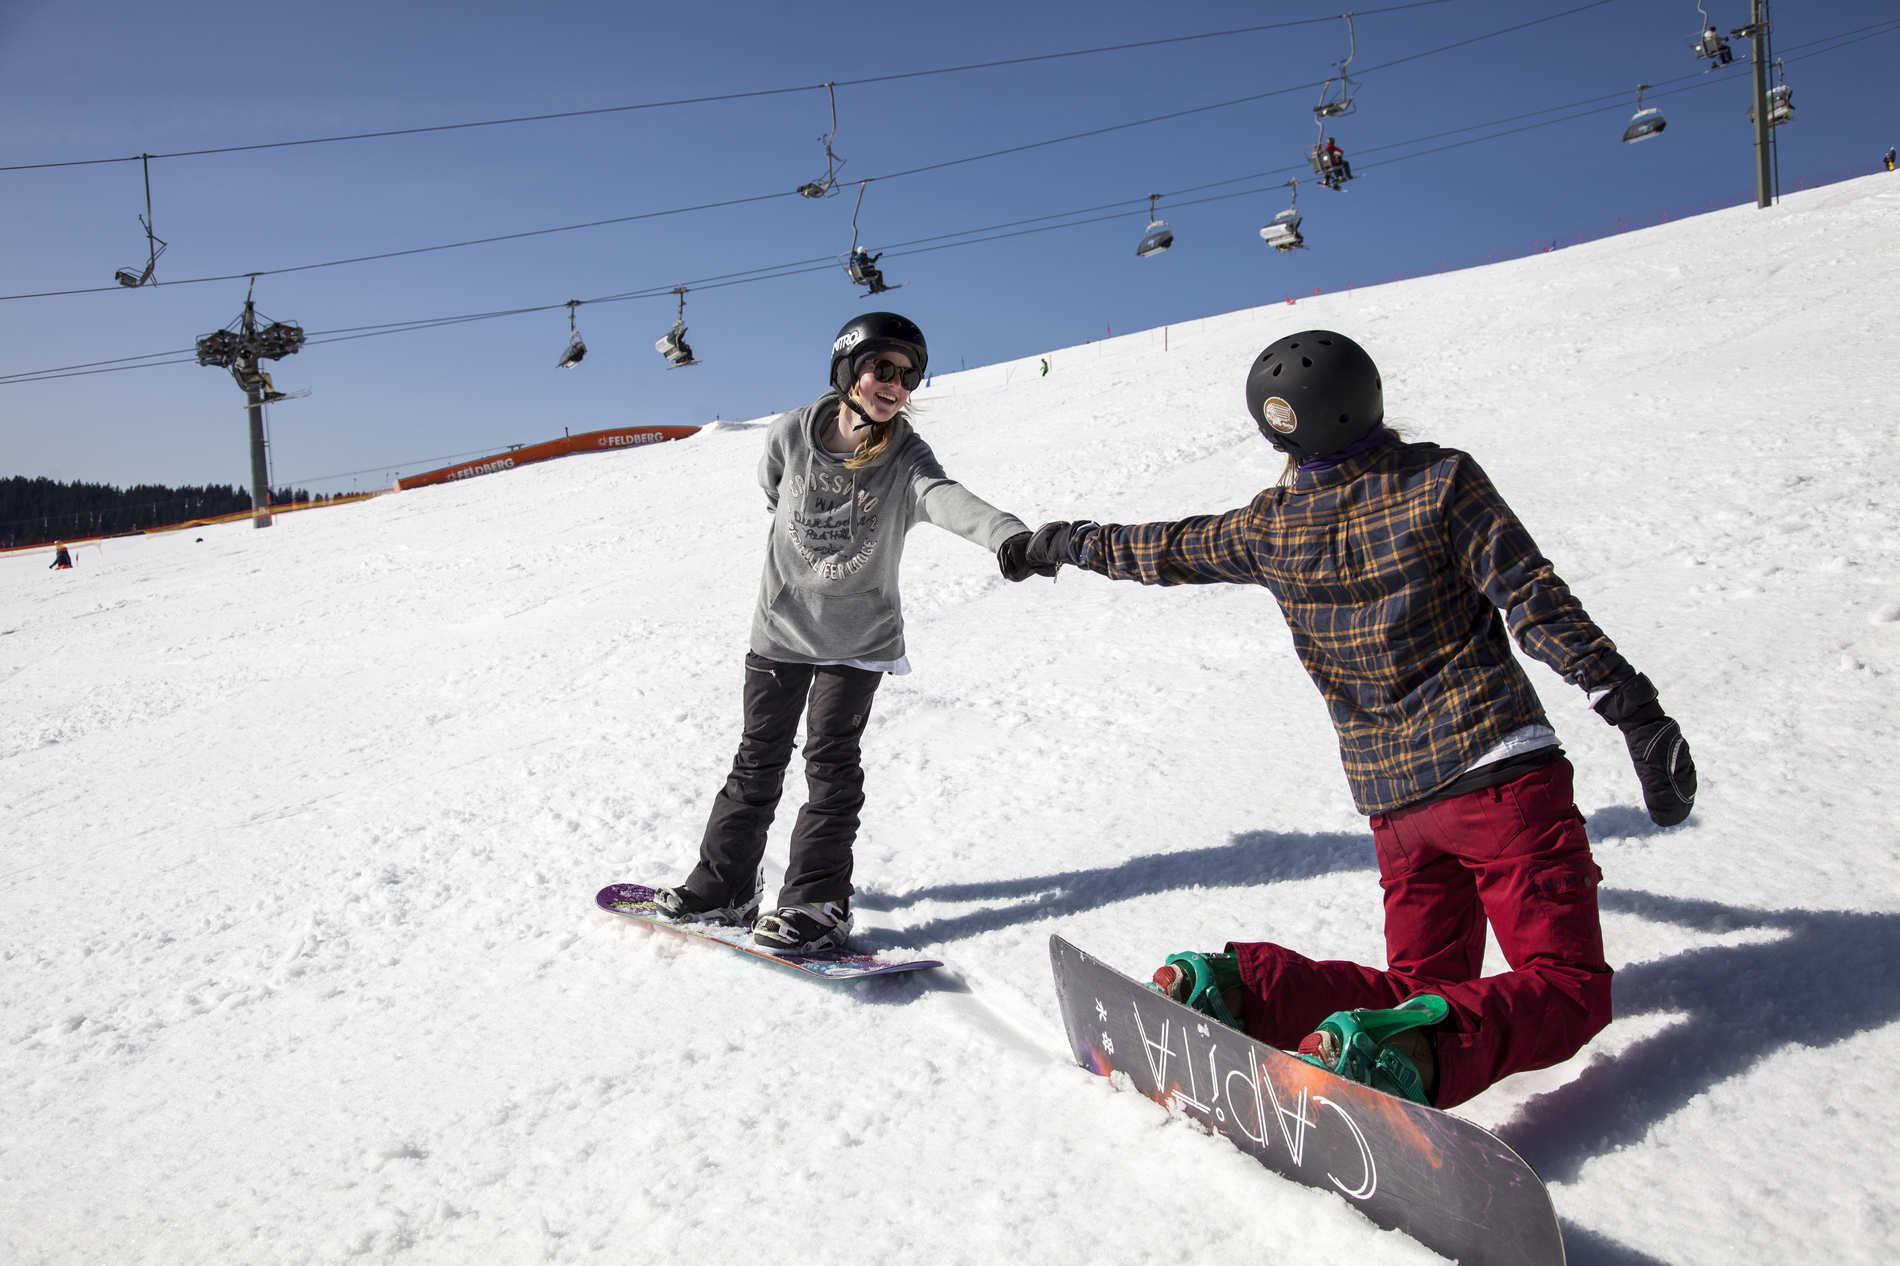 web snowpark feldberg 11 03 2017 lifestyle fs sb martin herrmann qparks 16